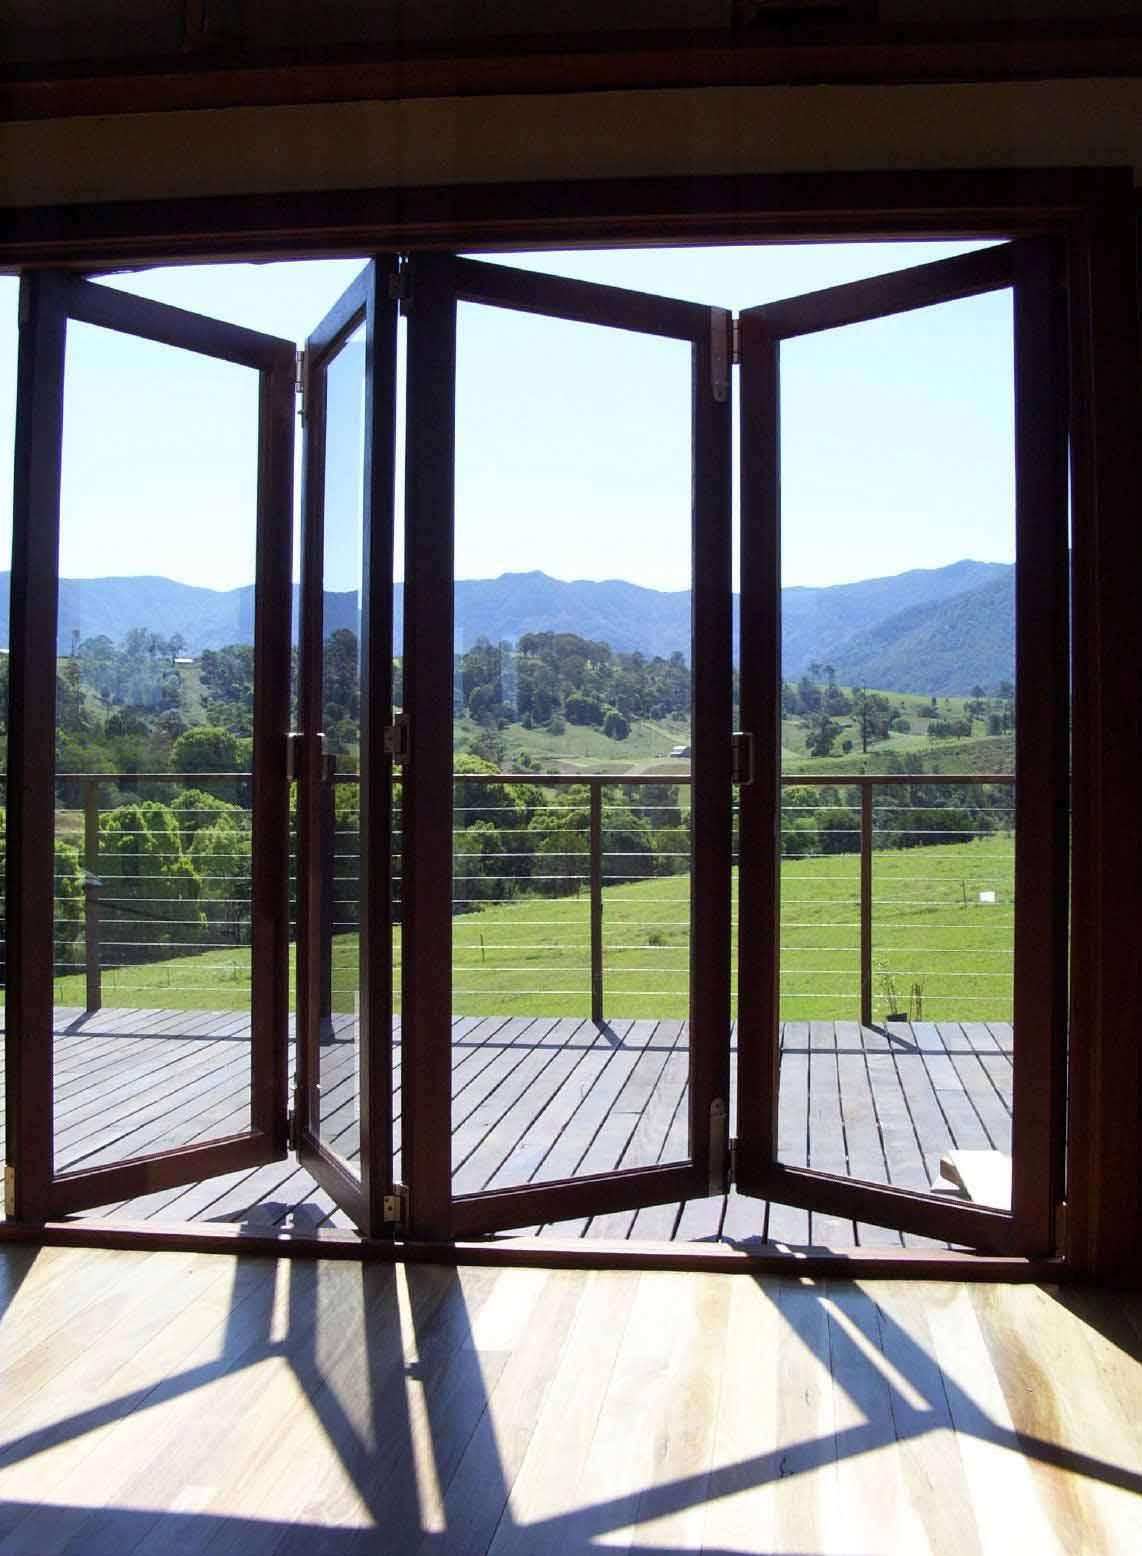 Glamorous Bifold Shop Door Images - Image design house plan - novelas.us